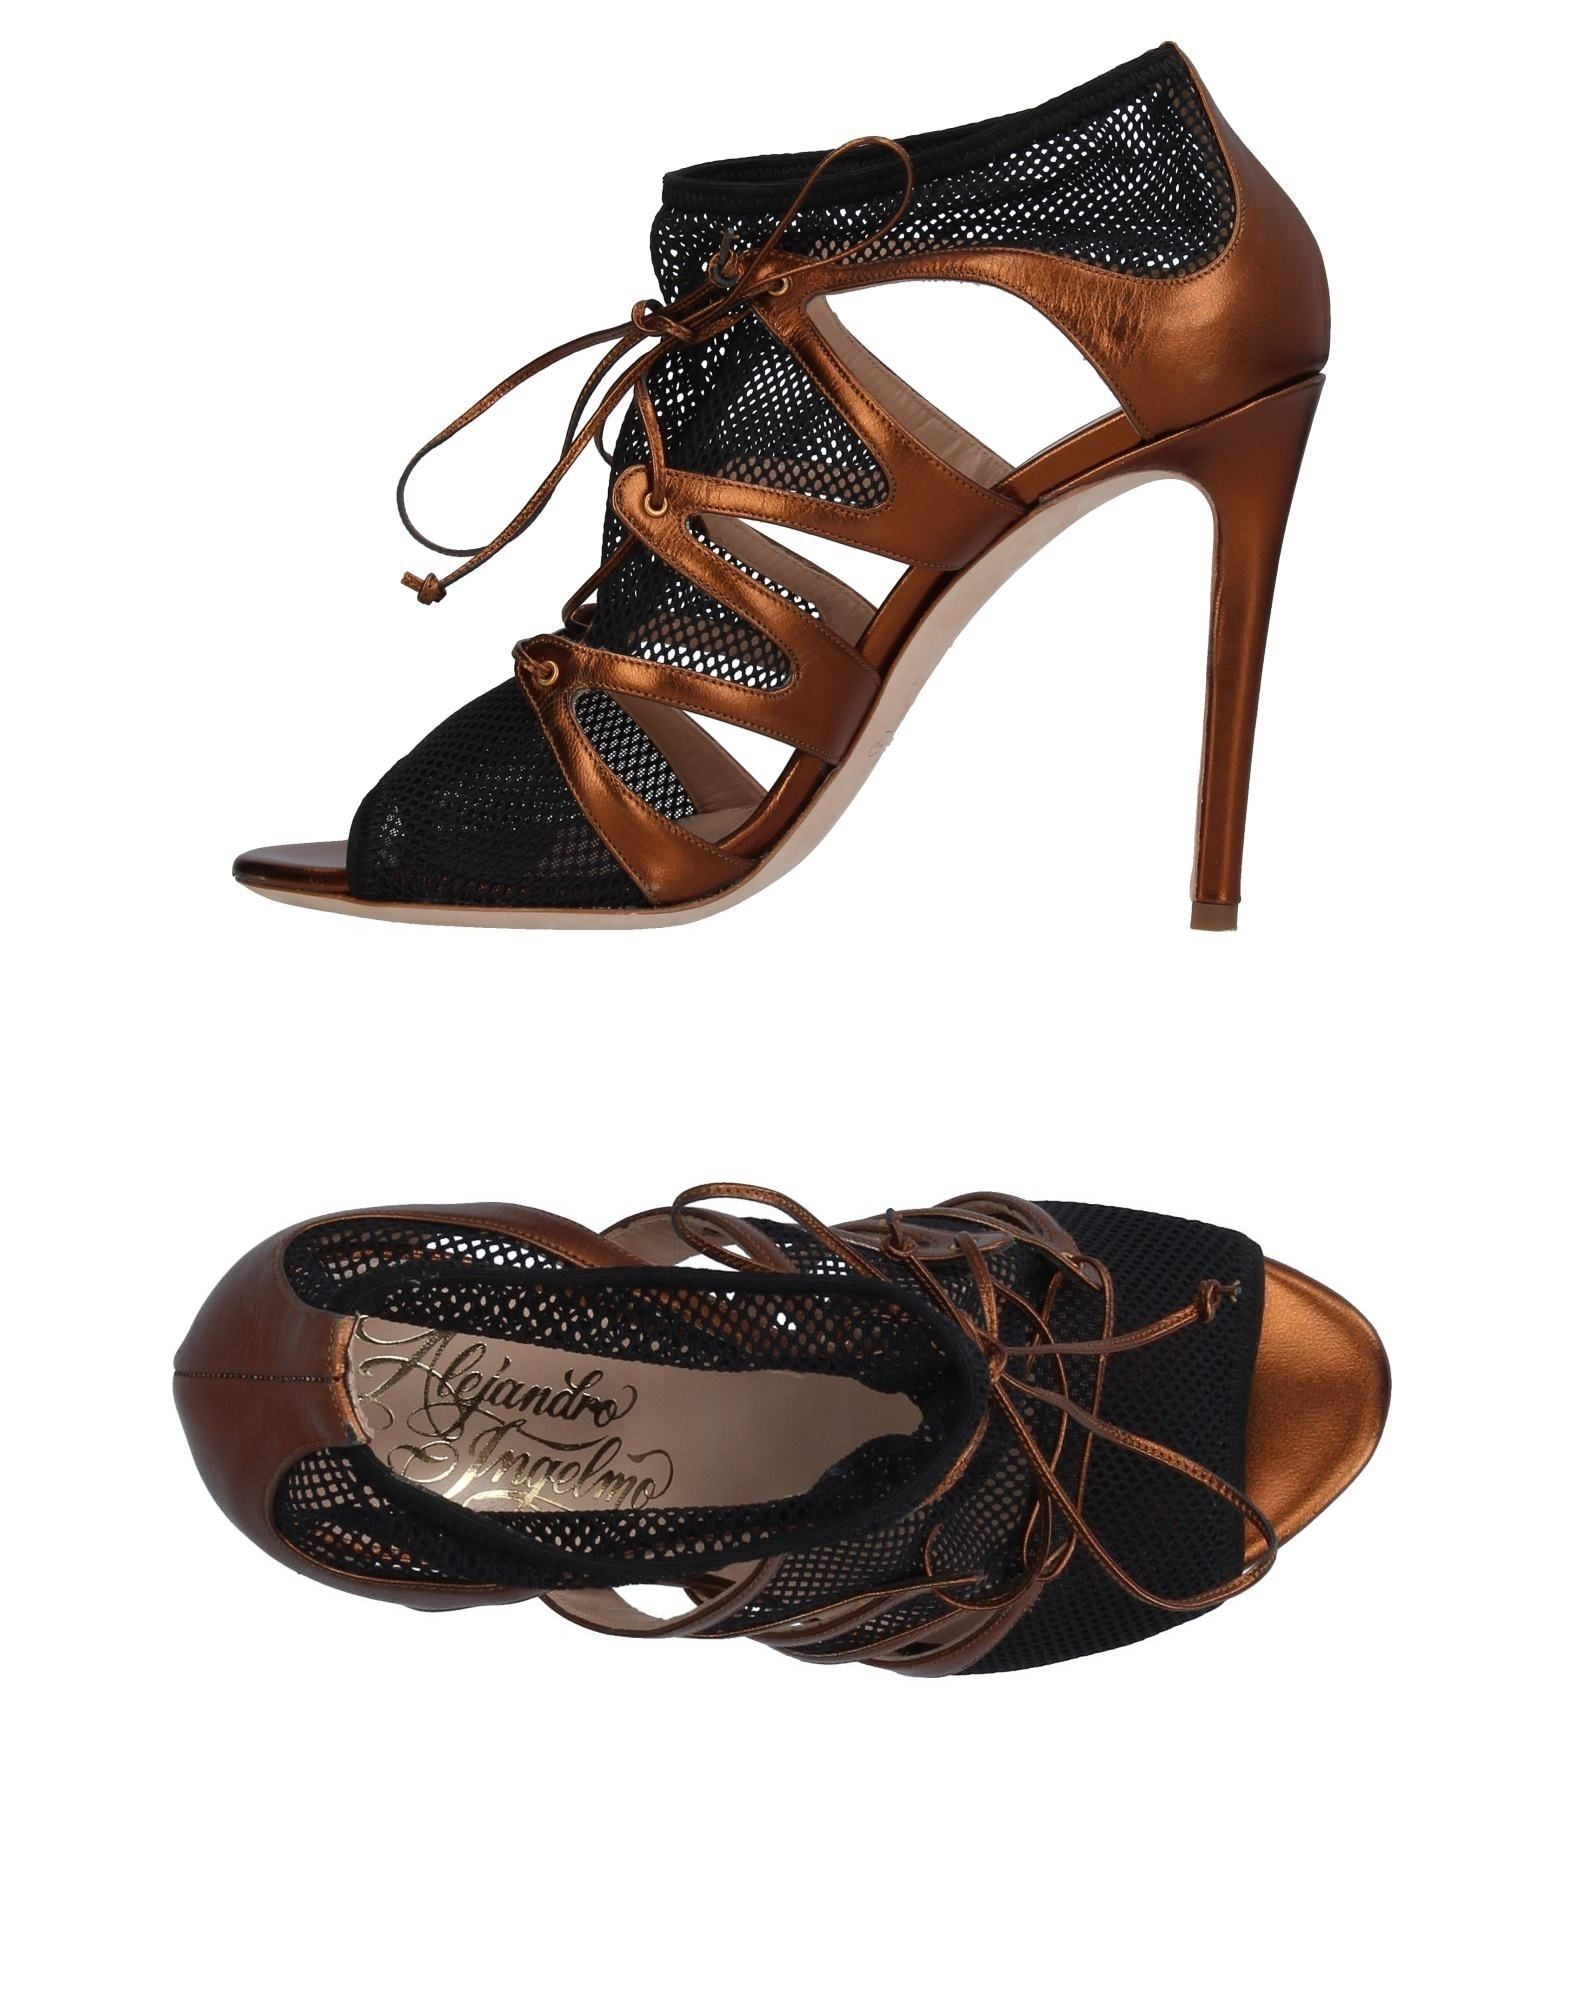 Alejandro Ingelmo Sandalen Damen  11369517UV Neue Schuhe